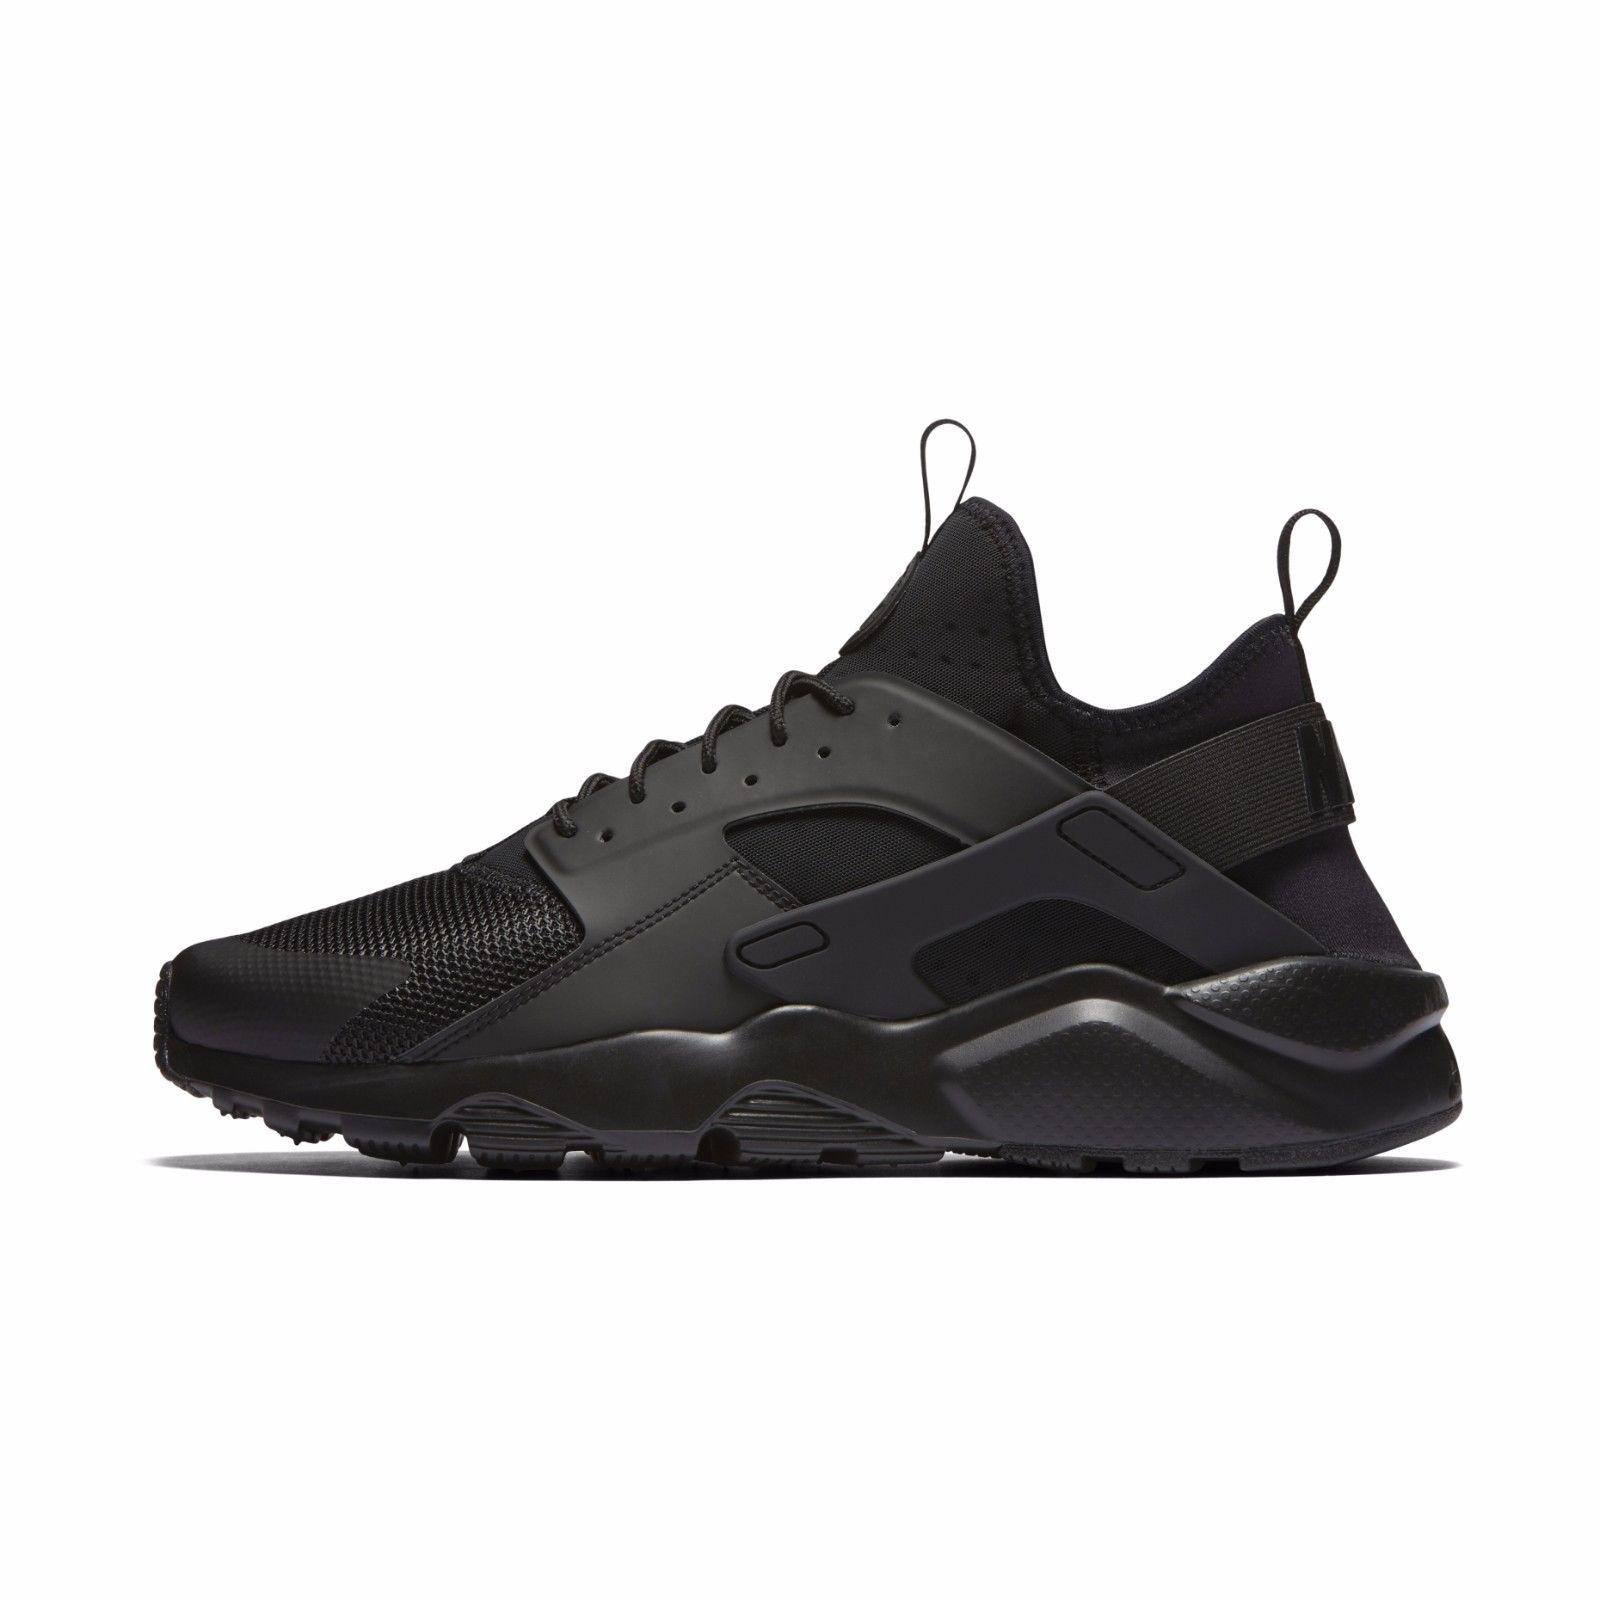 Black Running Shoes nike mens air huarache run ultra triple black running shoes sneakers  819685-002 MZFTRTX